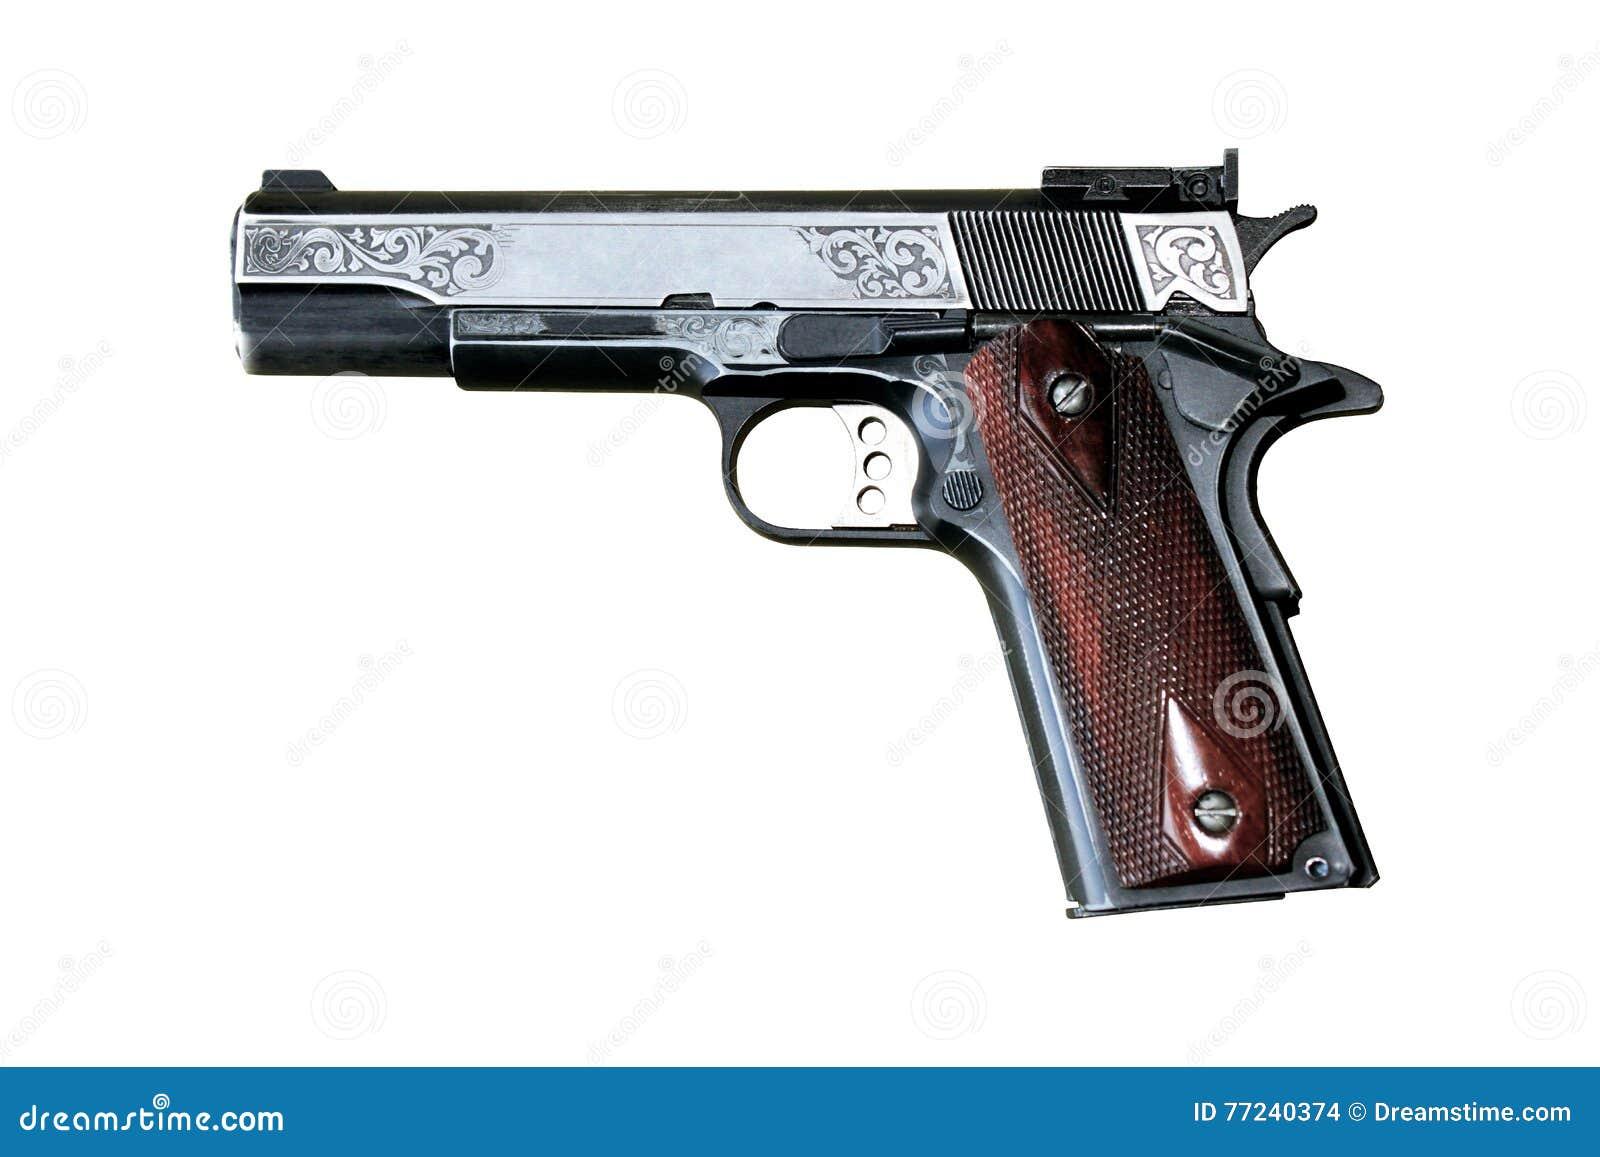 Pistol på vit bakgrund